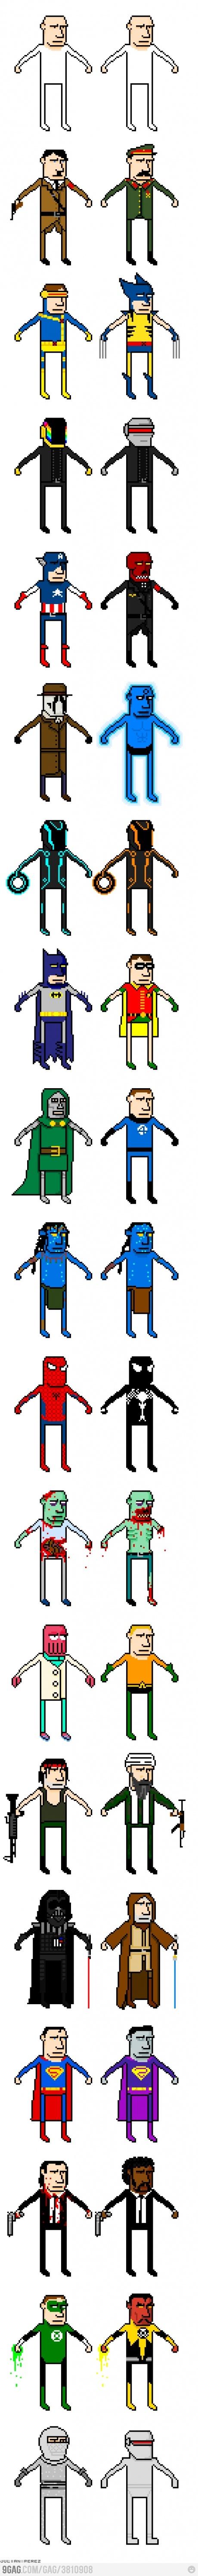 8-bit characters: Illustrations Comic Art, Ems 8 Bit, Evolution Infographic, Drawings, Dr. 8Bit, Ms Paintings, Couple, Animal, Comic Artworks